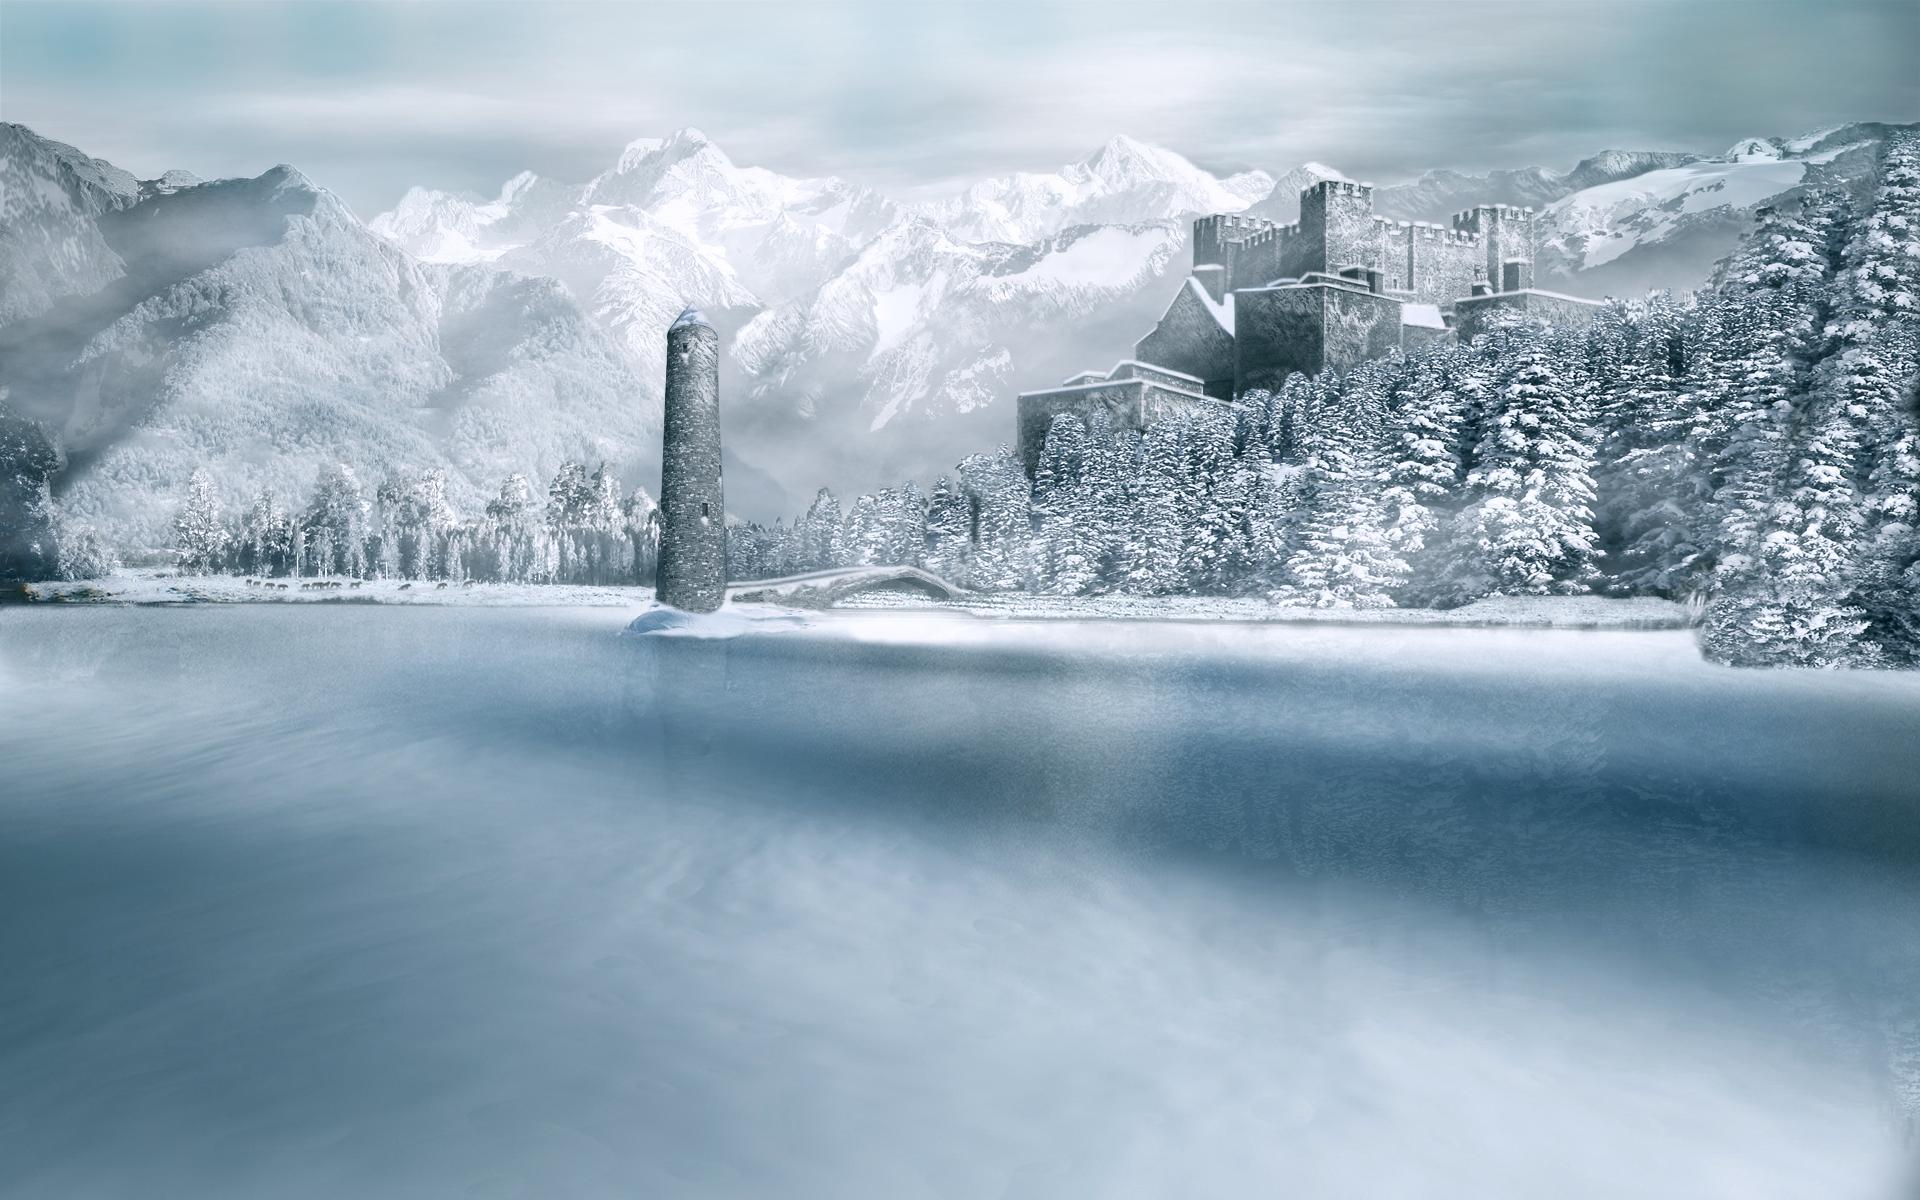 winter to sumer_Final_v1.jpg